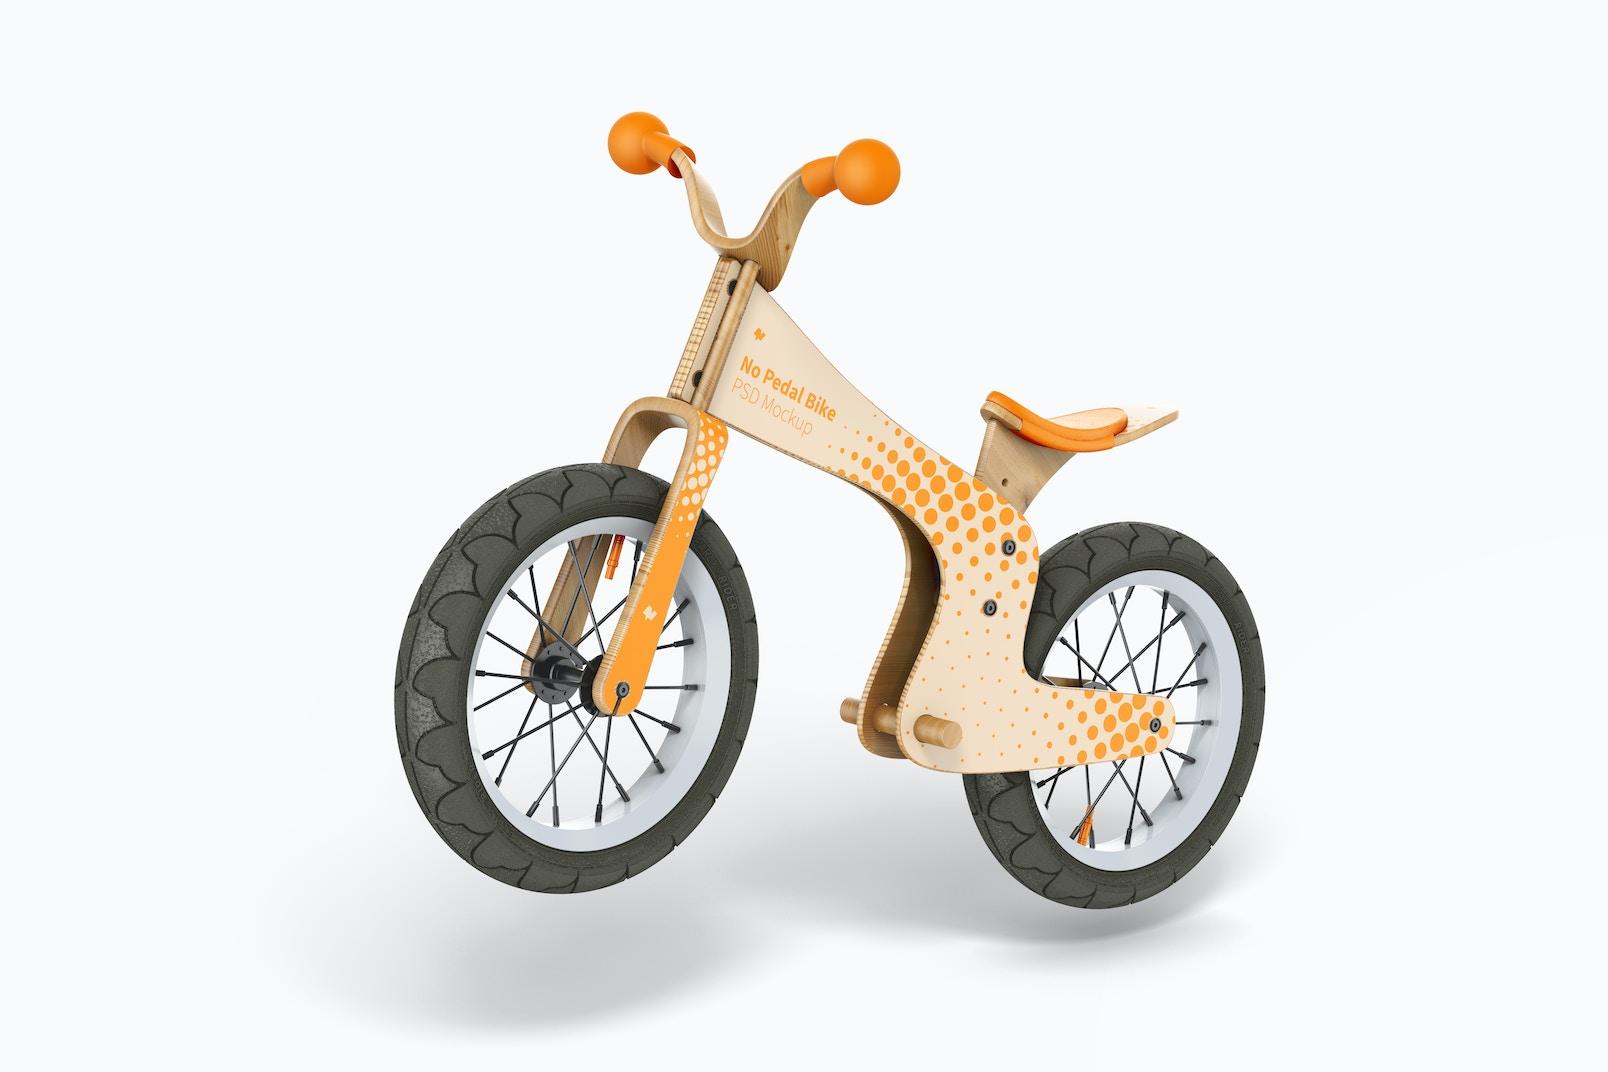 No Pedal Bike Mockup, Falling